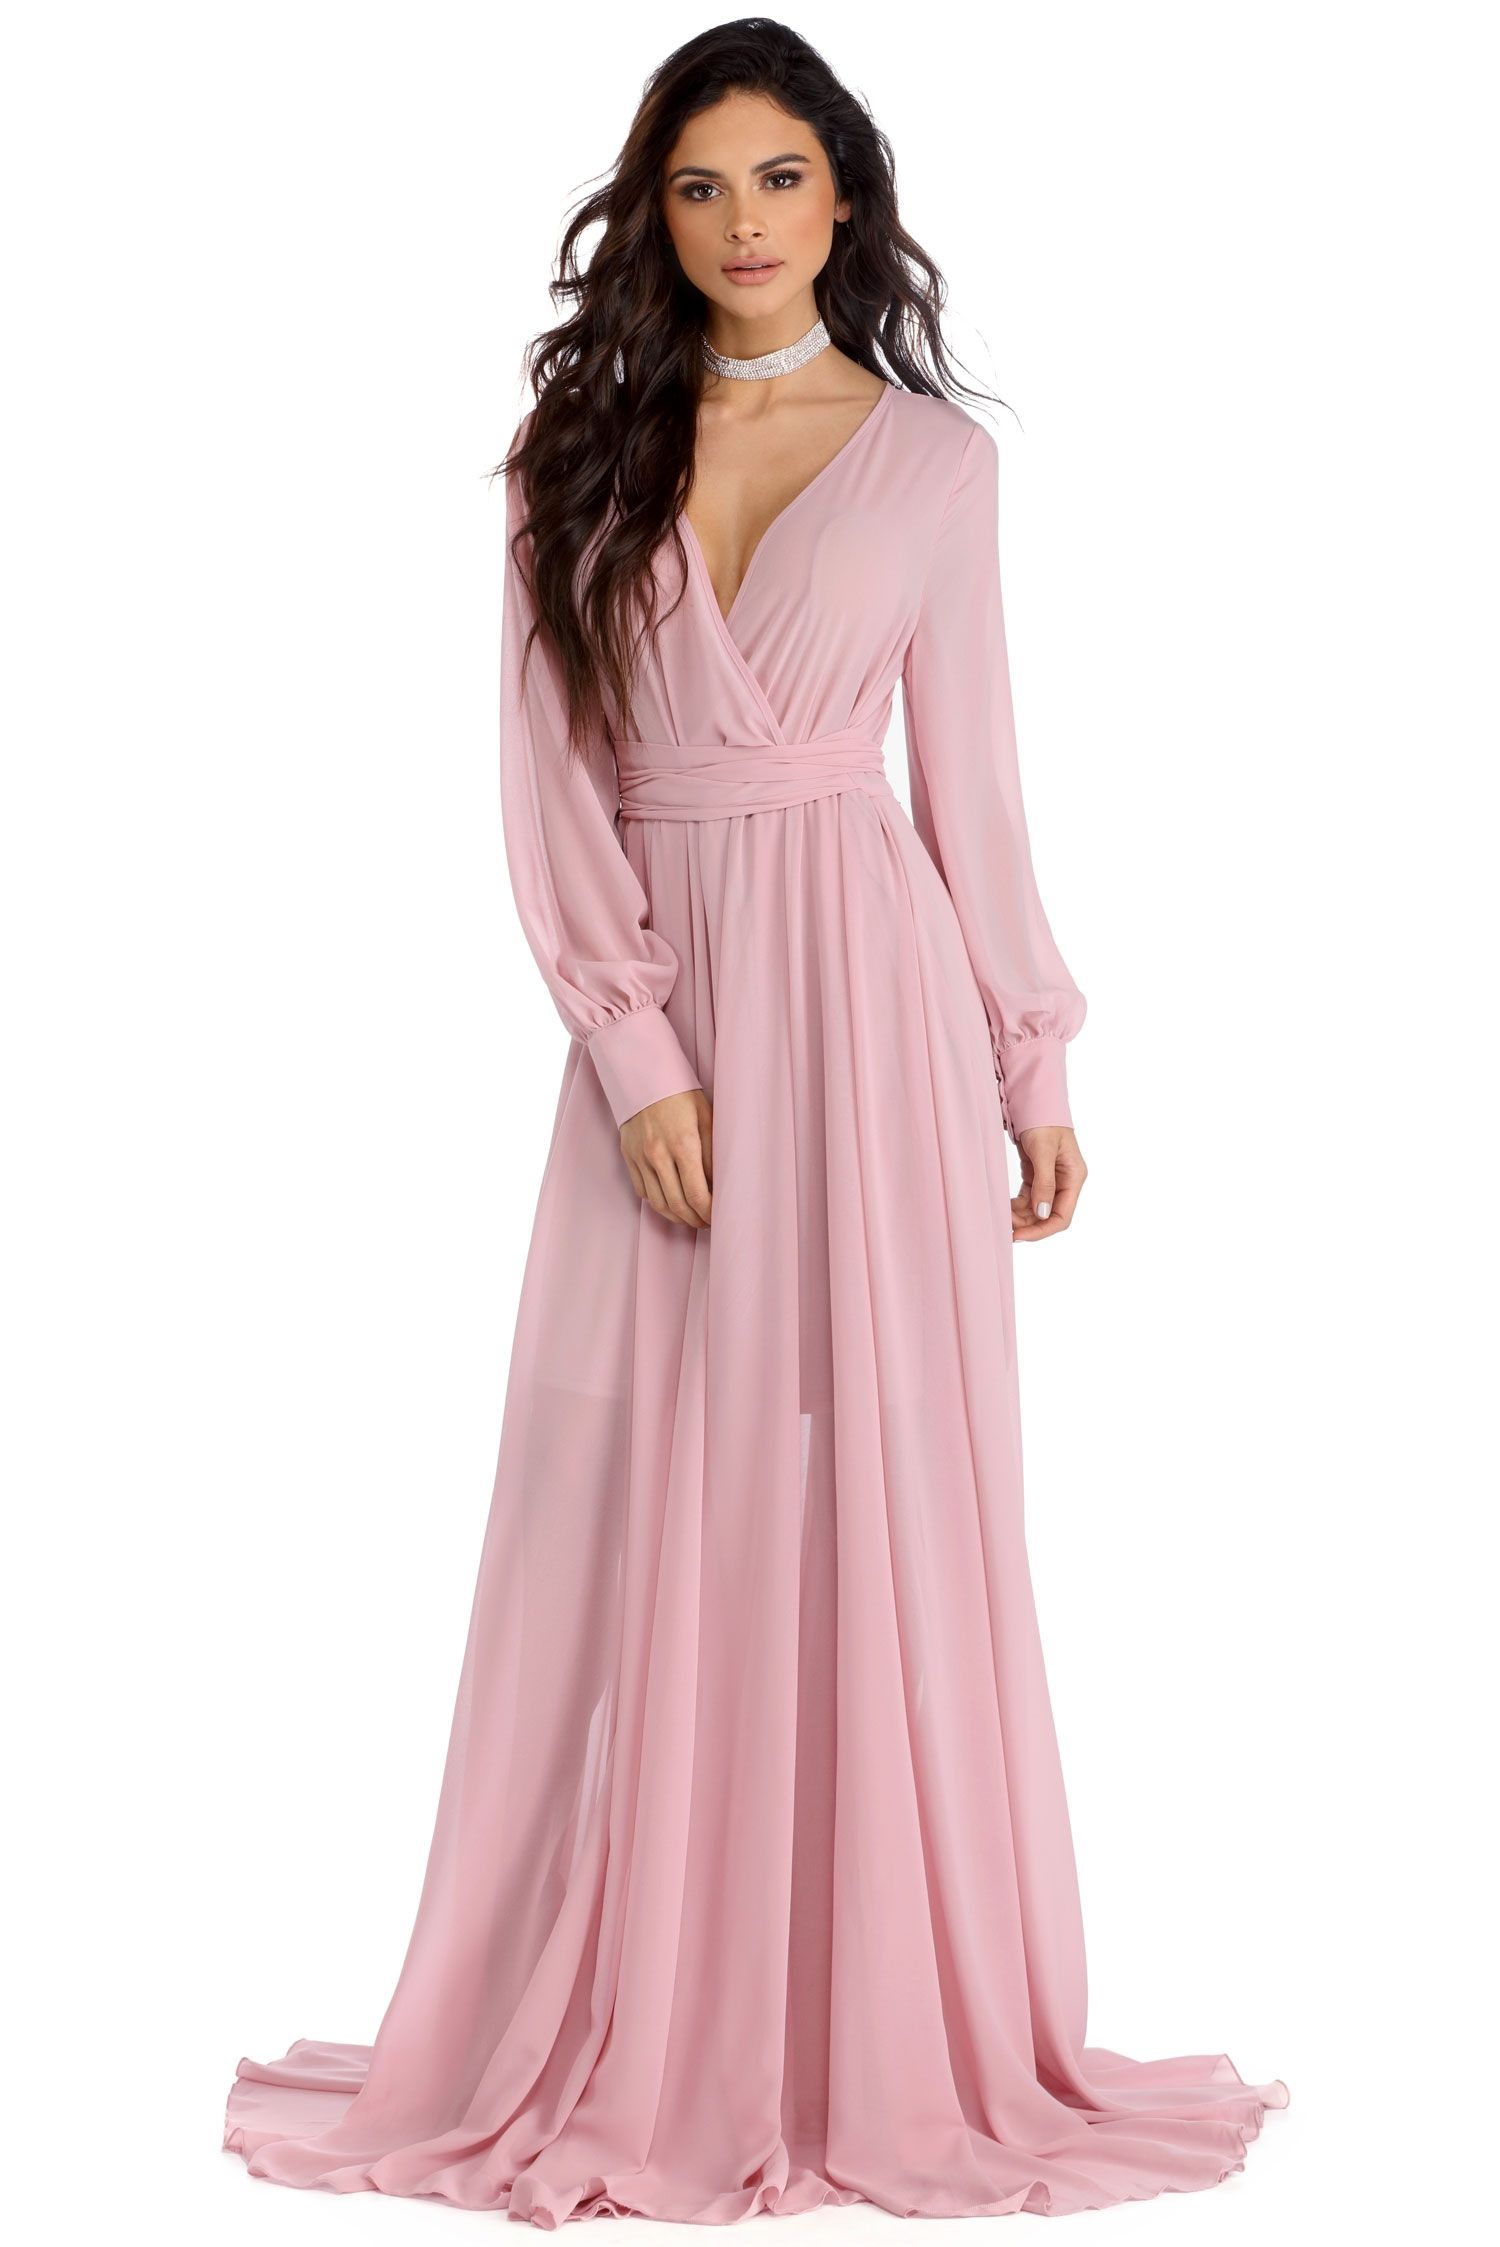 Charlotte Mauve Romance Dress | Wedding | Pinterest | Mauve ...